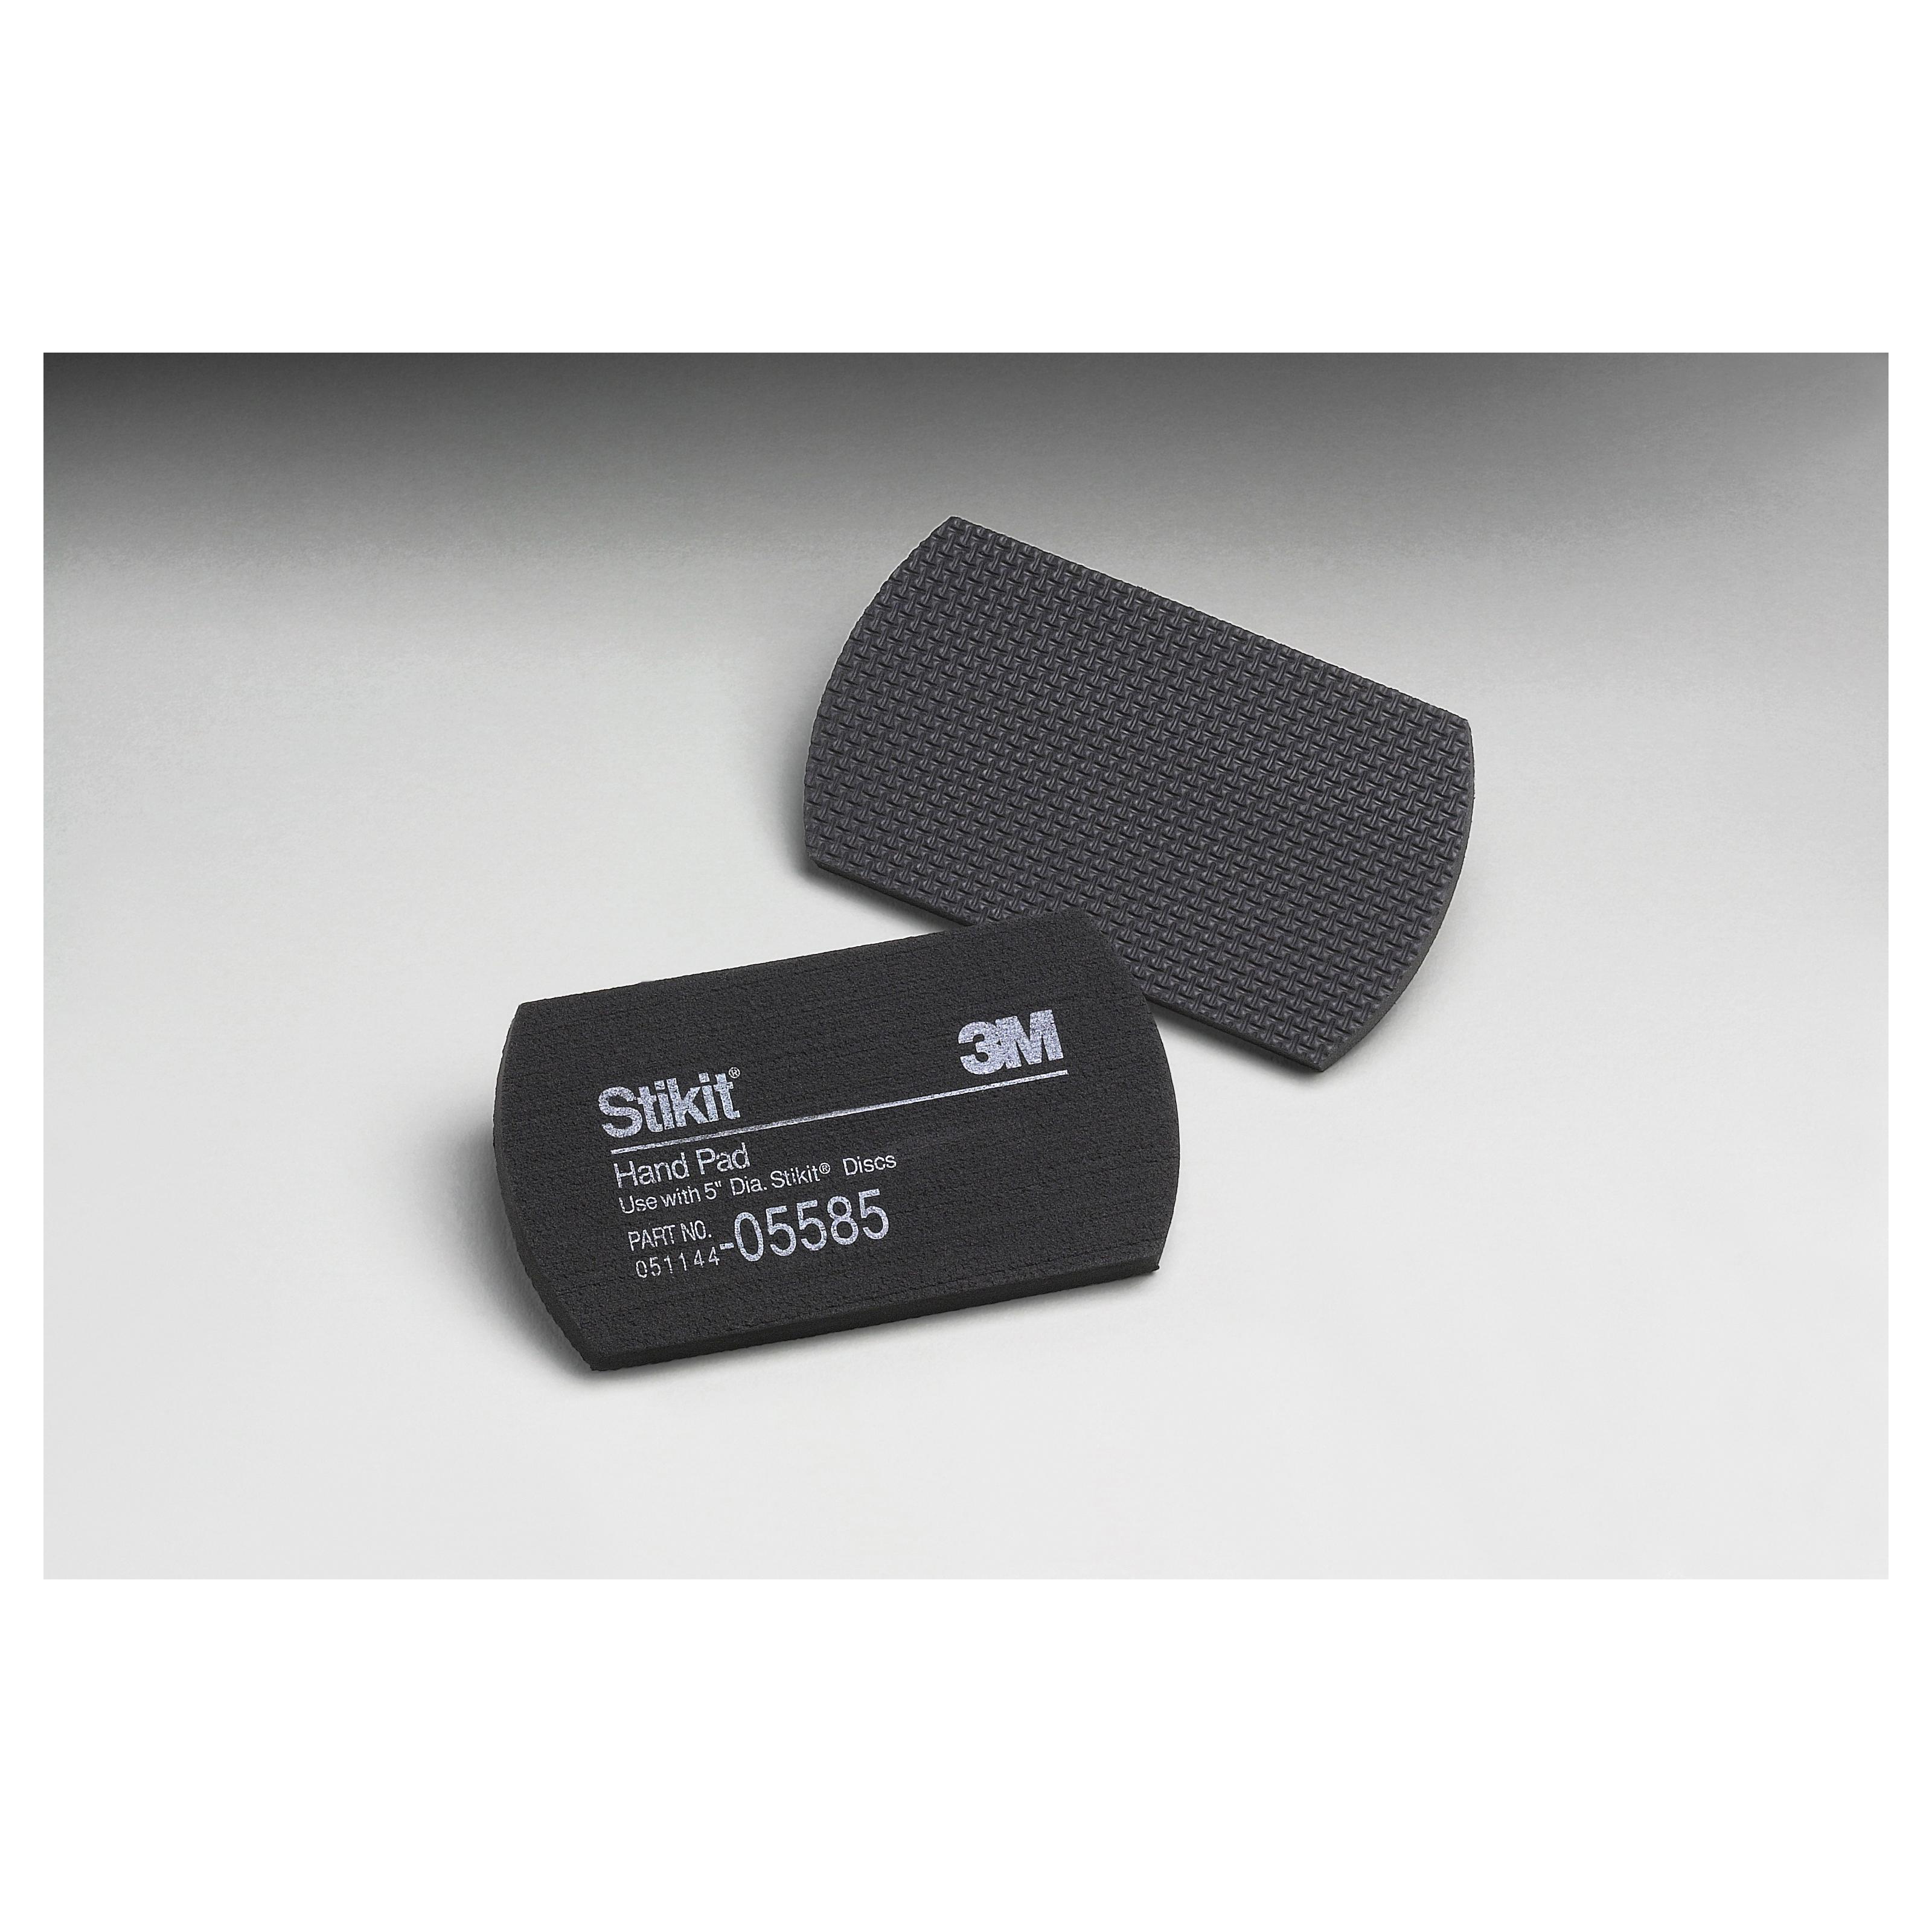 3M™ Stikit™ 051144-05585 Regular Hand Pad, 5 in L, 2-3/4 in W W/Dia, 3/8 in THK